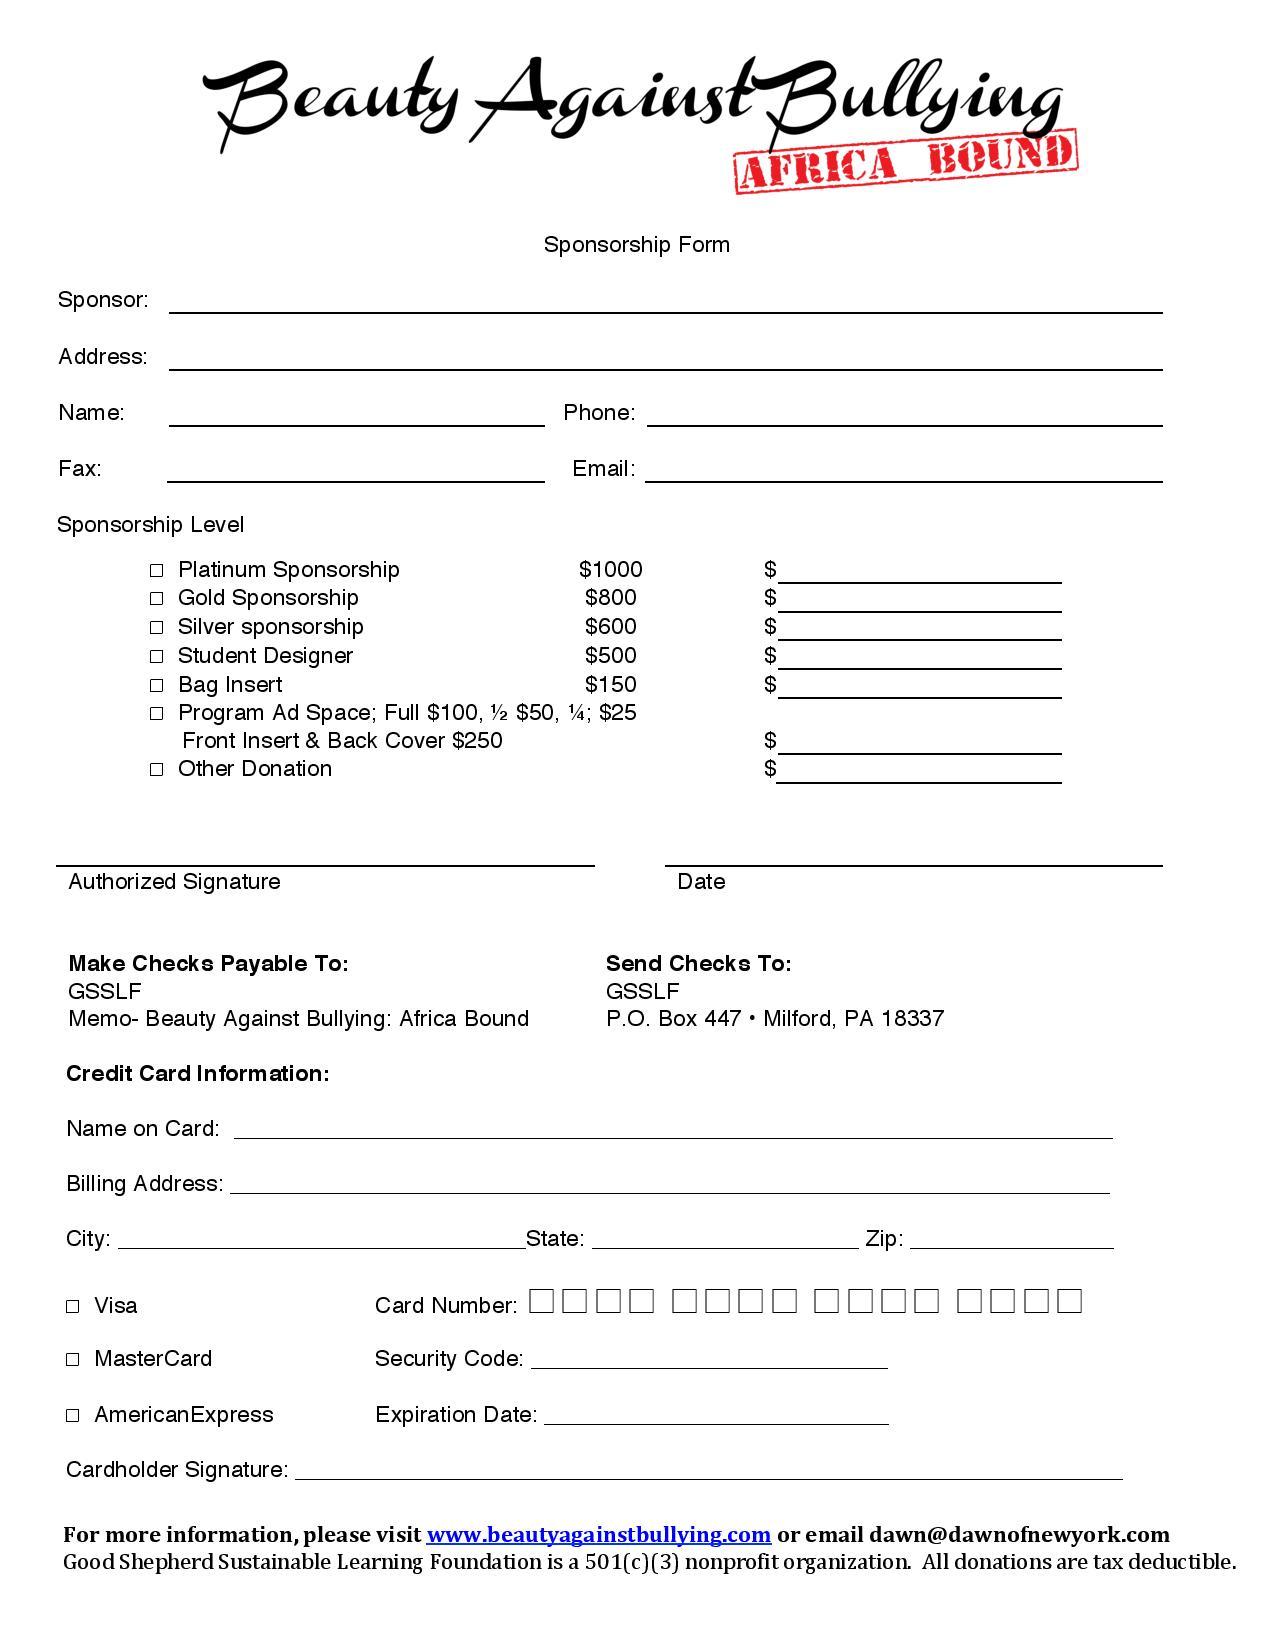 SPONSORSHIP FORM-page-001.jpg